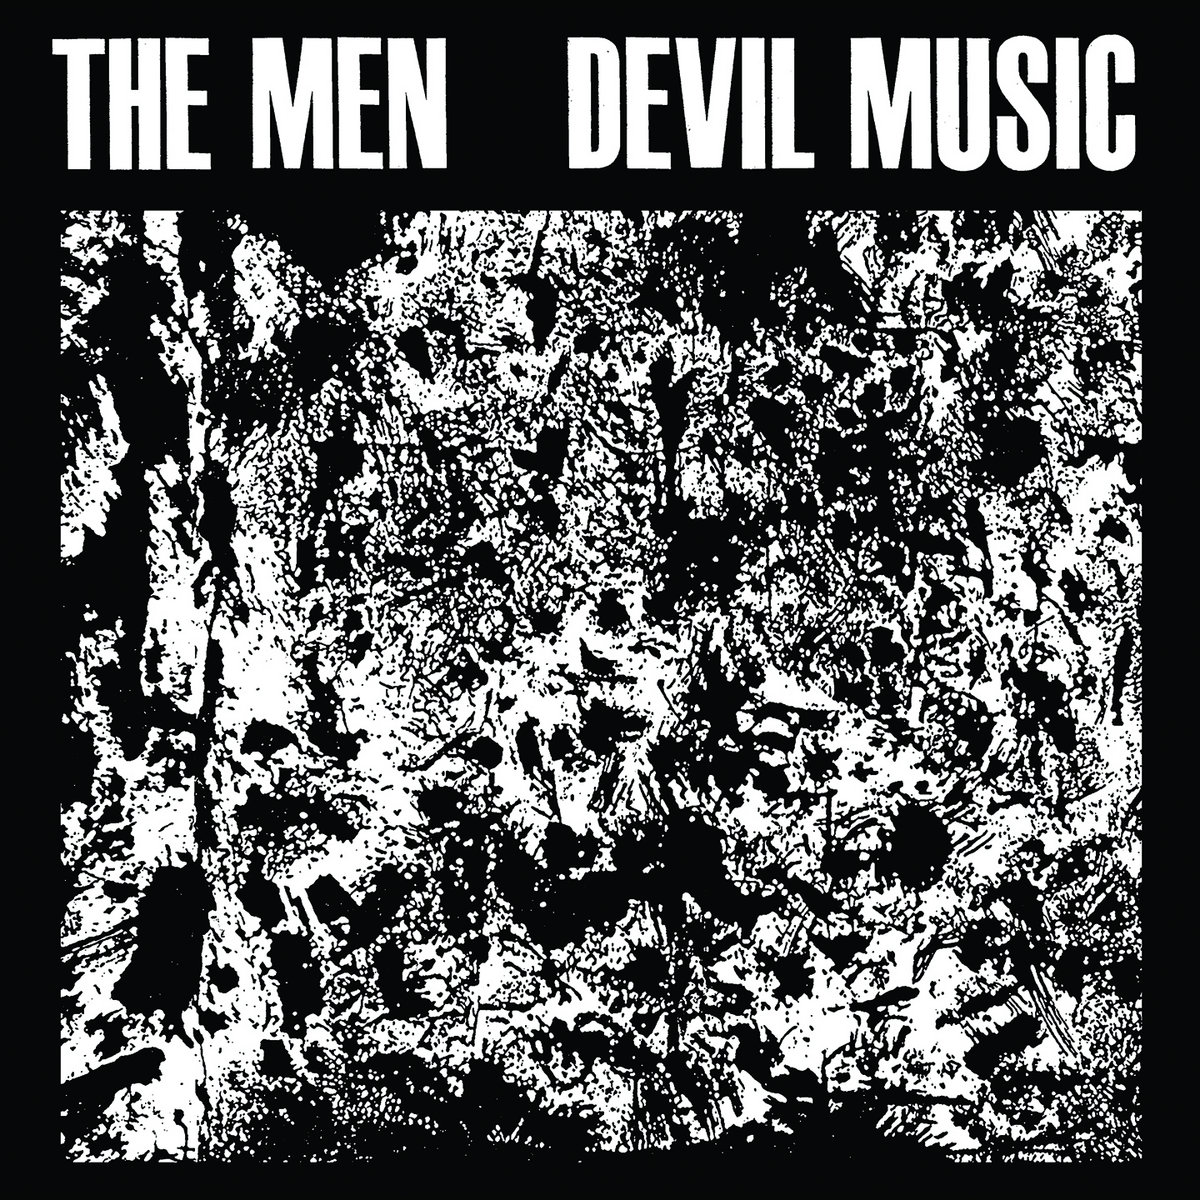 Image result for men devil music